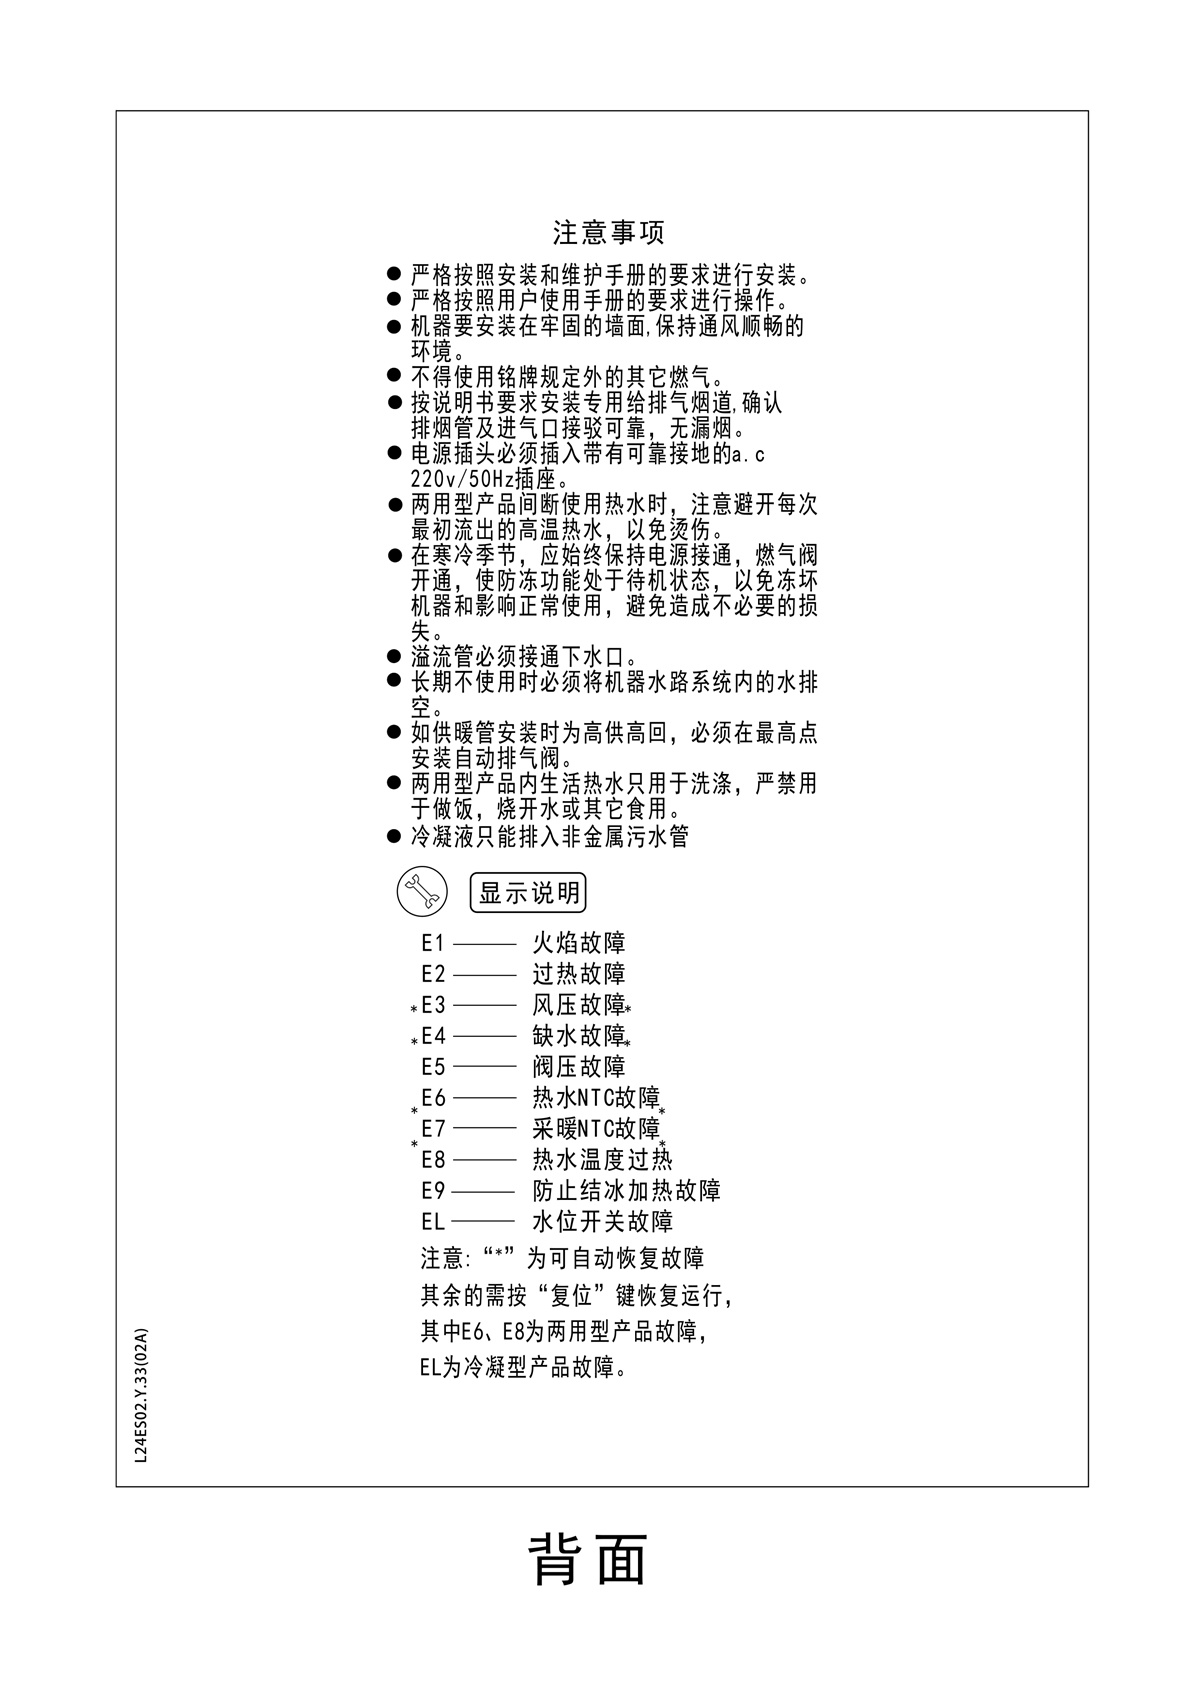 ES02系列-用户使用手册-10_03.jpg